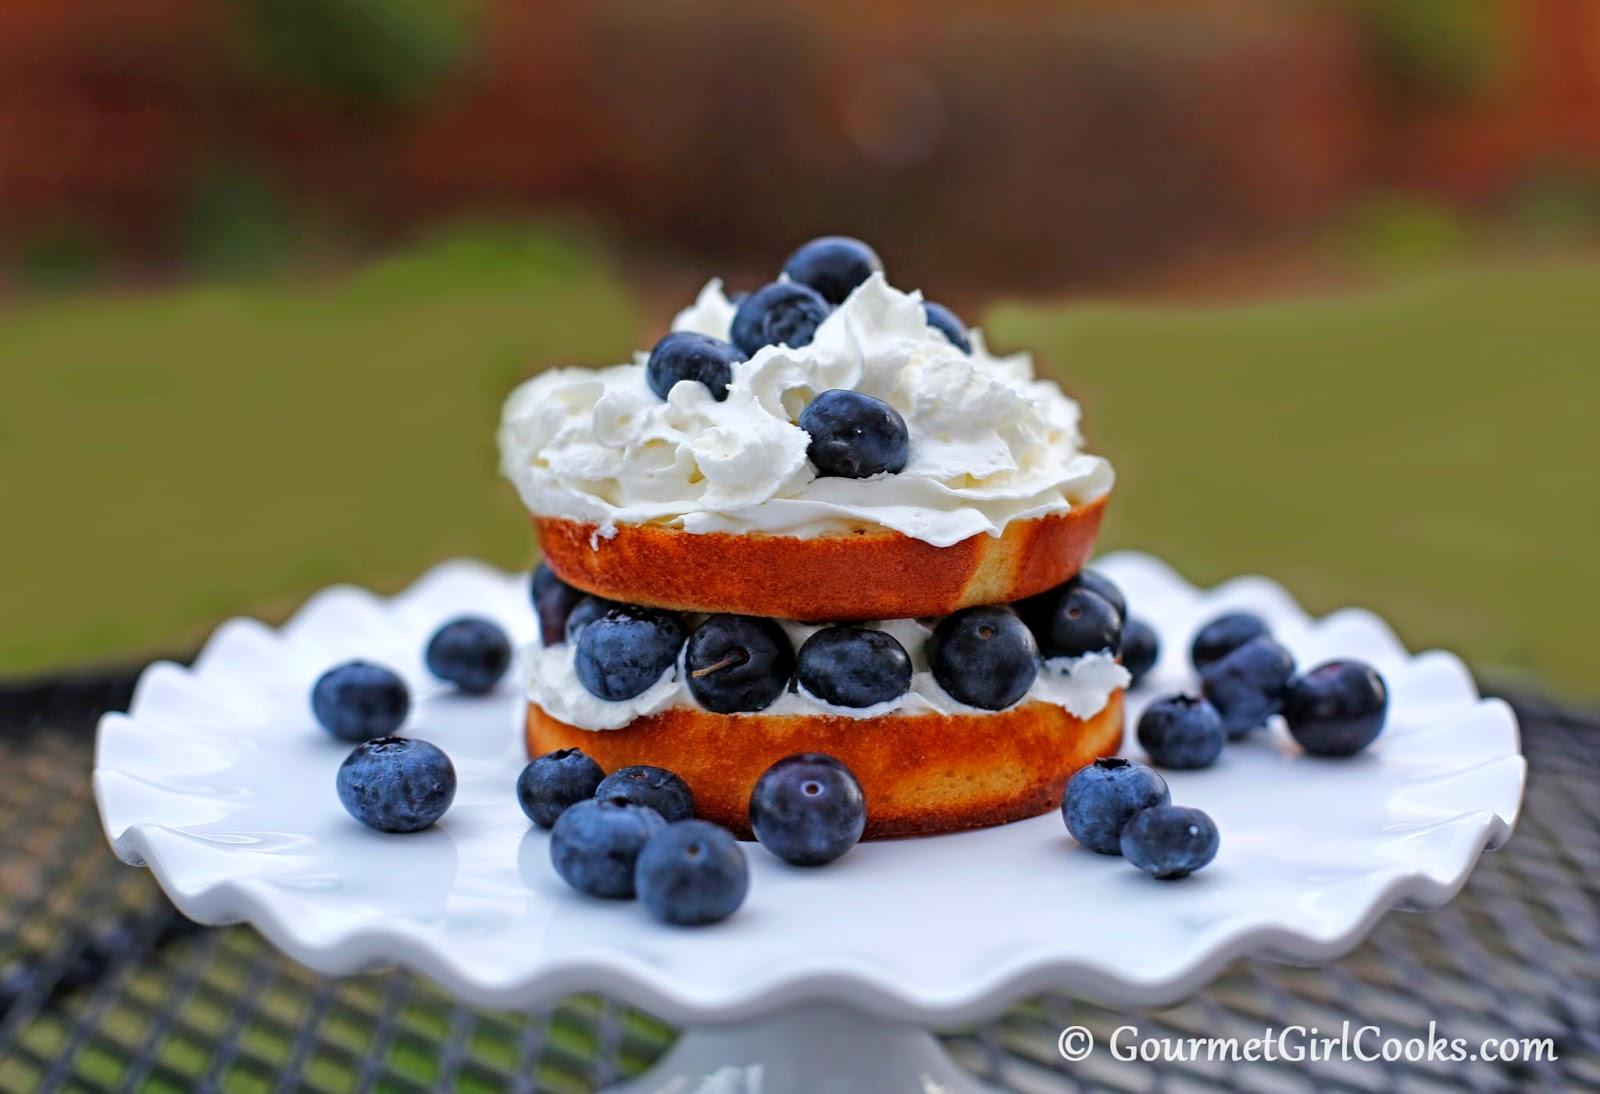 ... Shortcake Season - Low Carb Blueberry Shortcake & Strawberry Shortcake